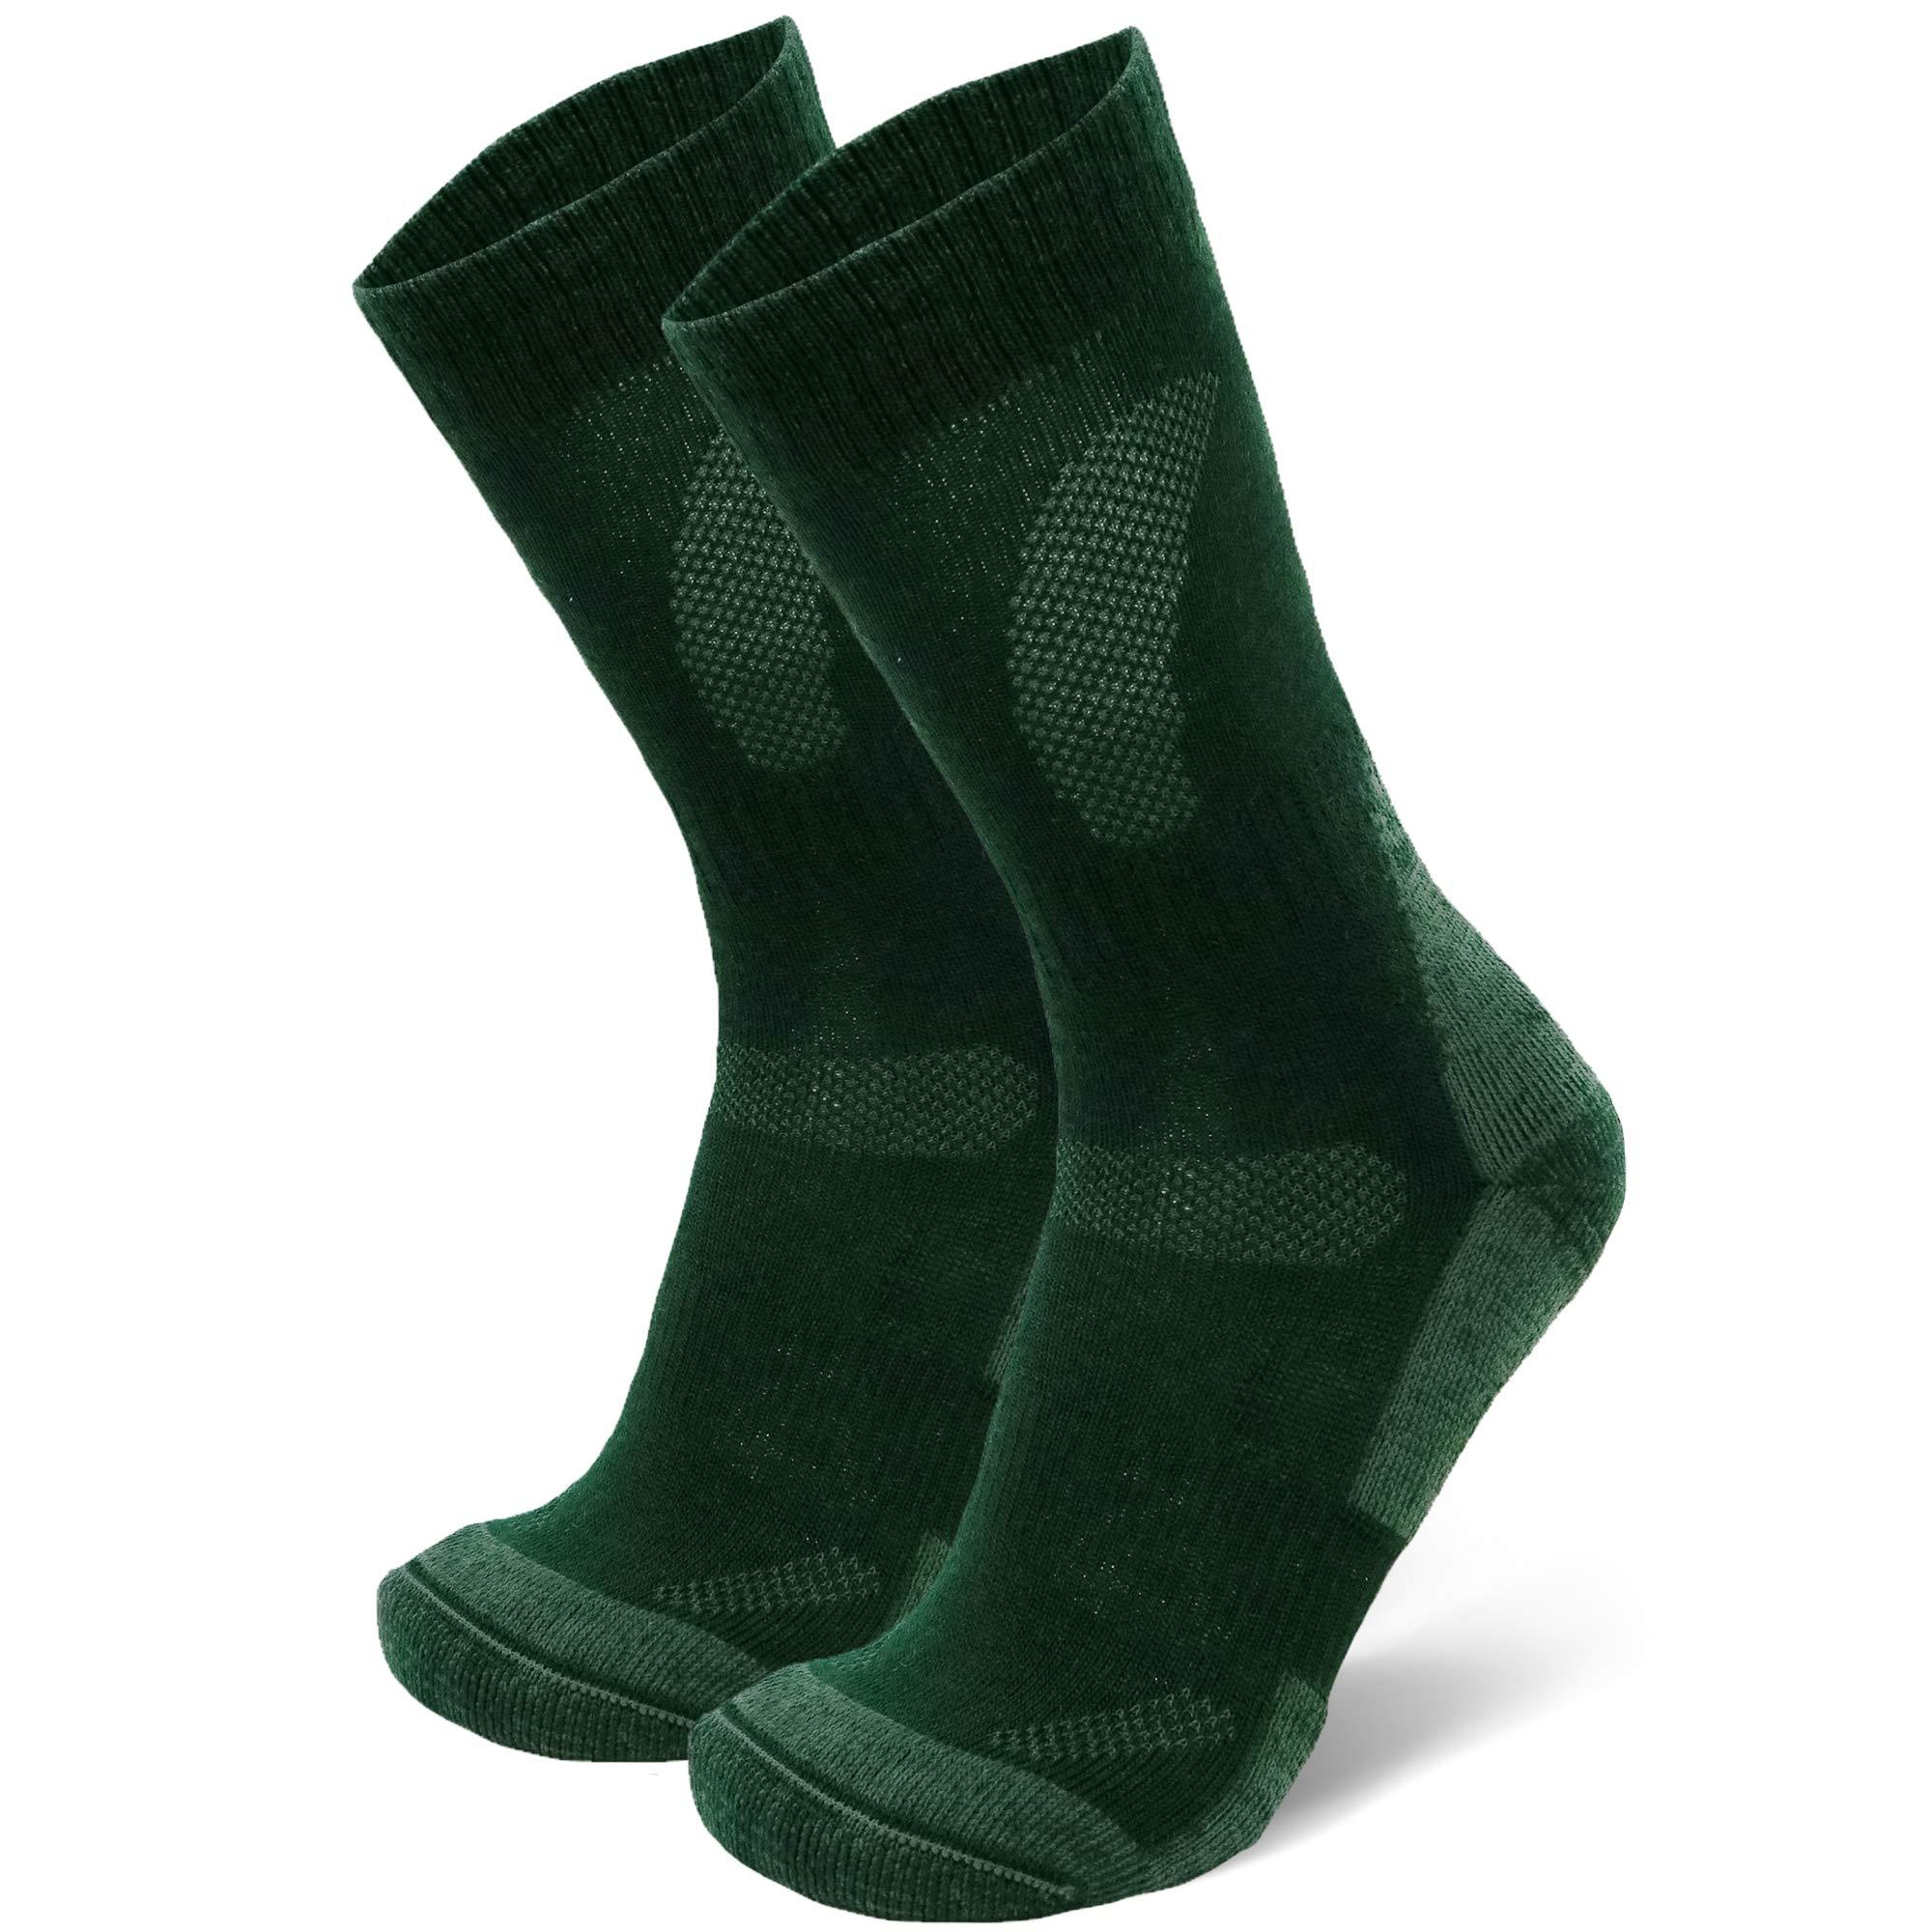 Merino Wool Hiking & Trekking Socks (Forest Green 1 Pair, US Women 5-7 // US Men 3.5-6) by DANISH ENDURANCE